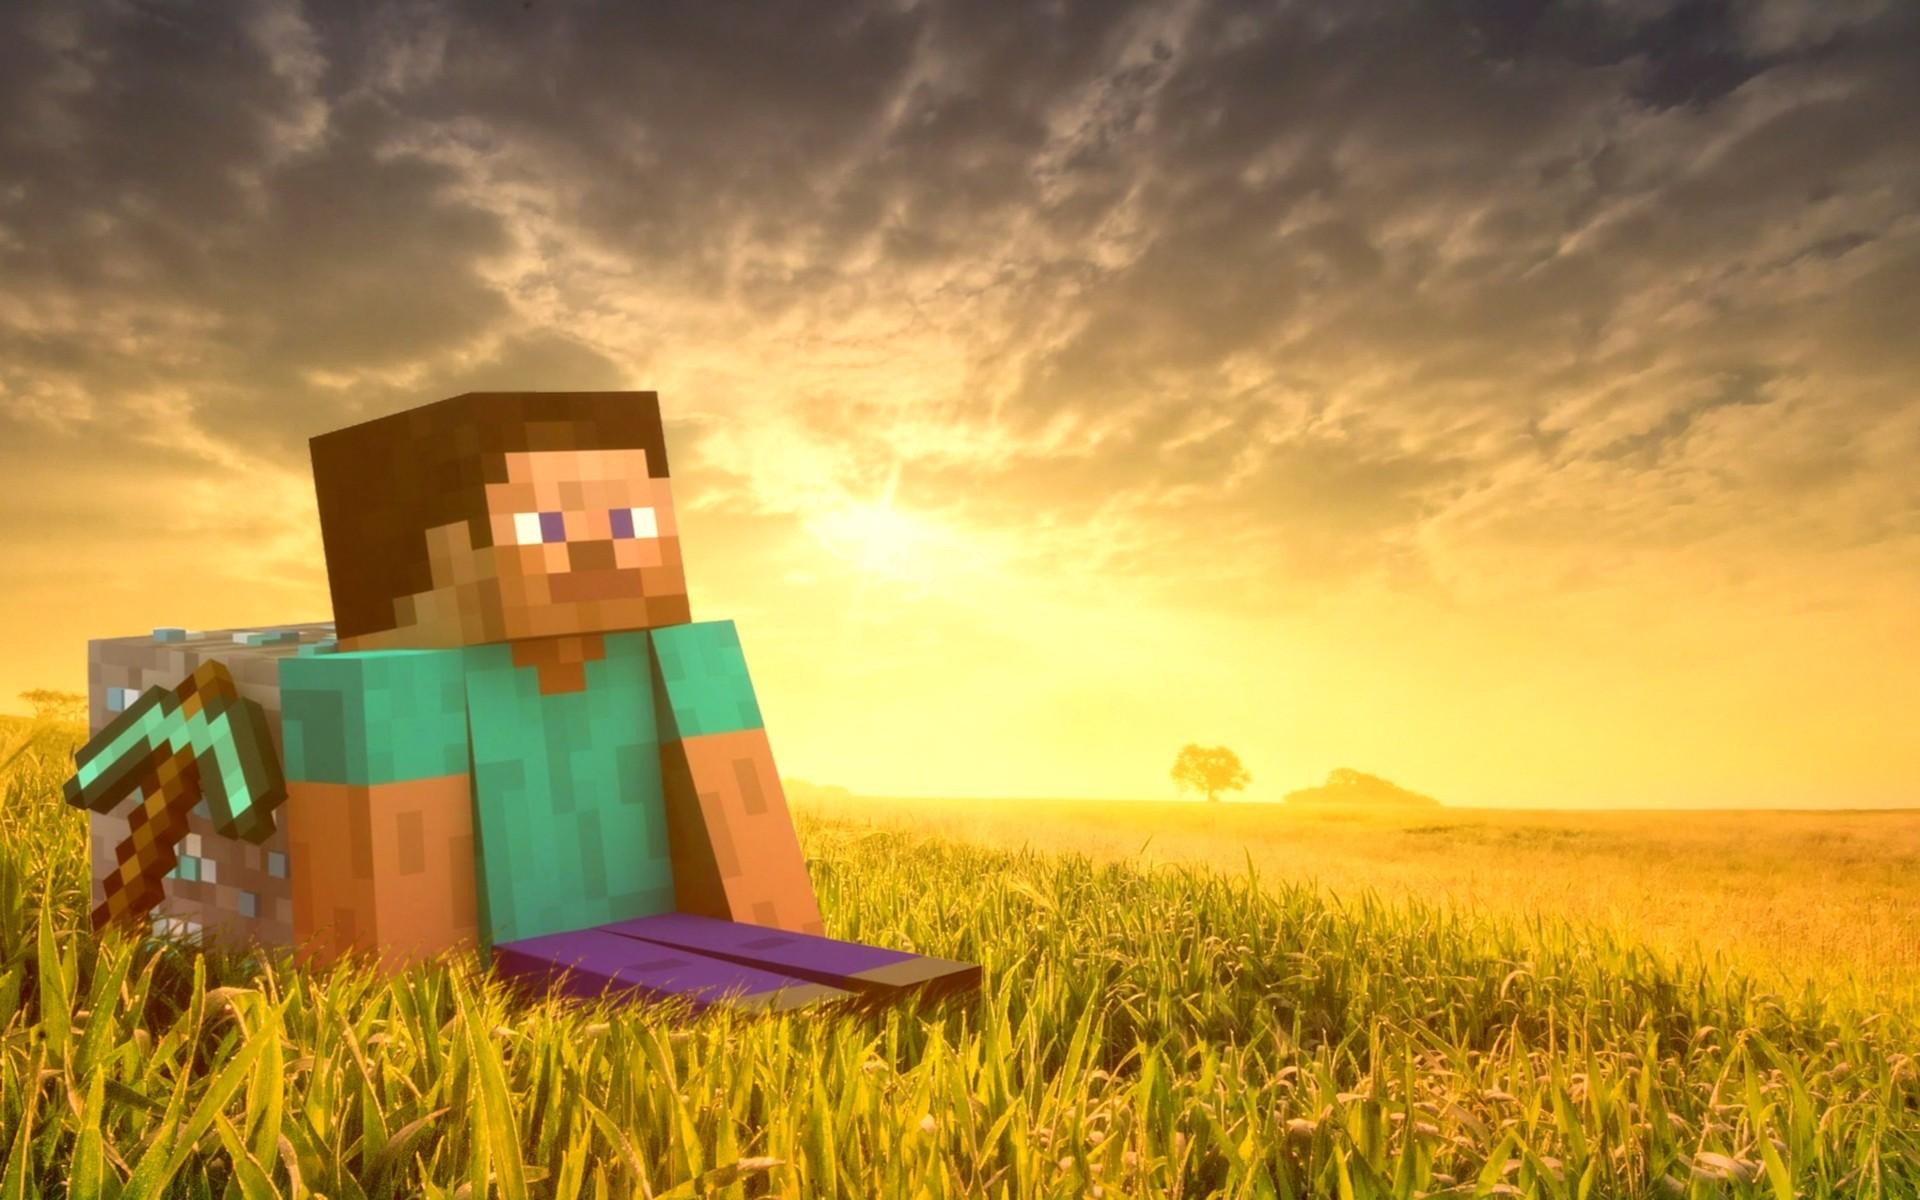 fondos-de-pantalla-de-minecraft-Steve-Minecraft-Wallpapers-HD-Wallpaper